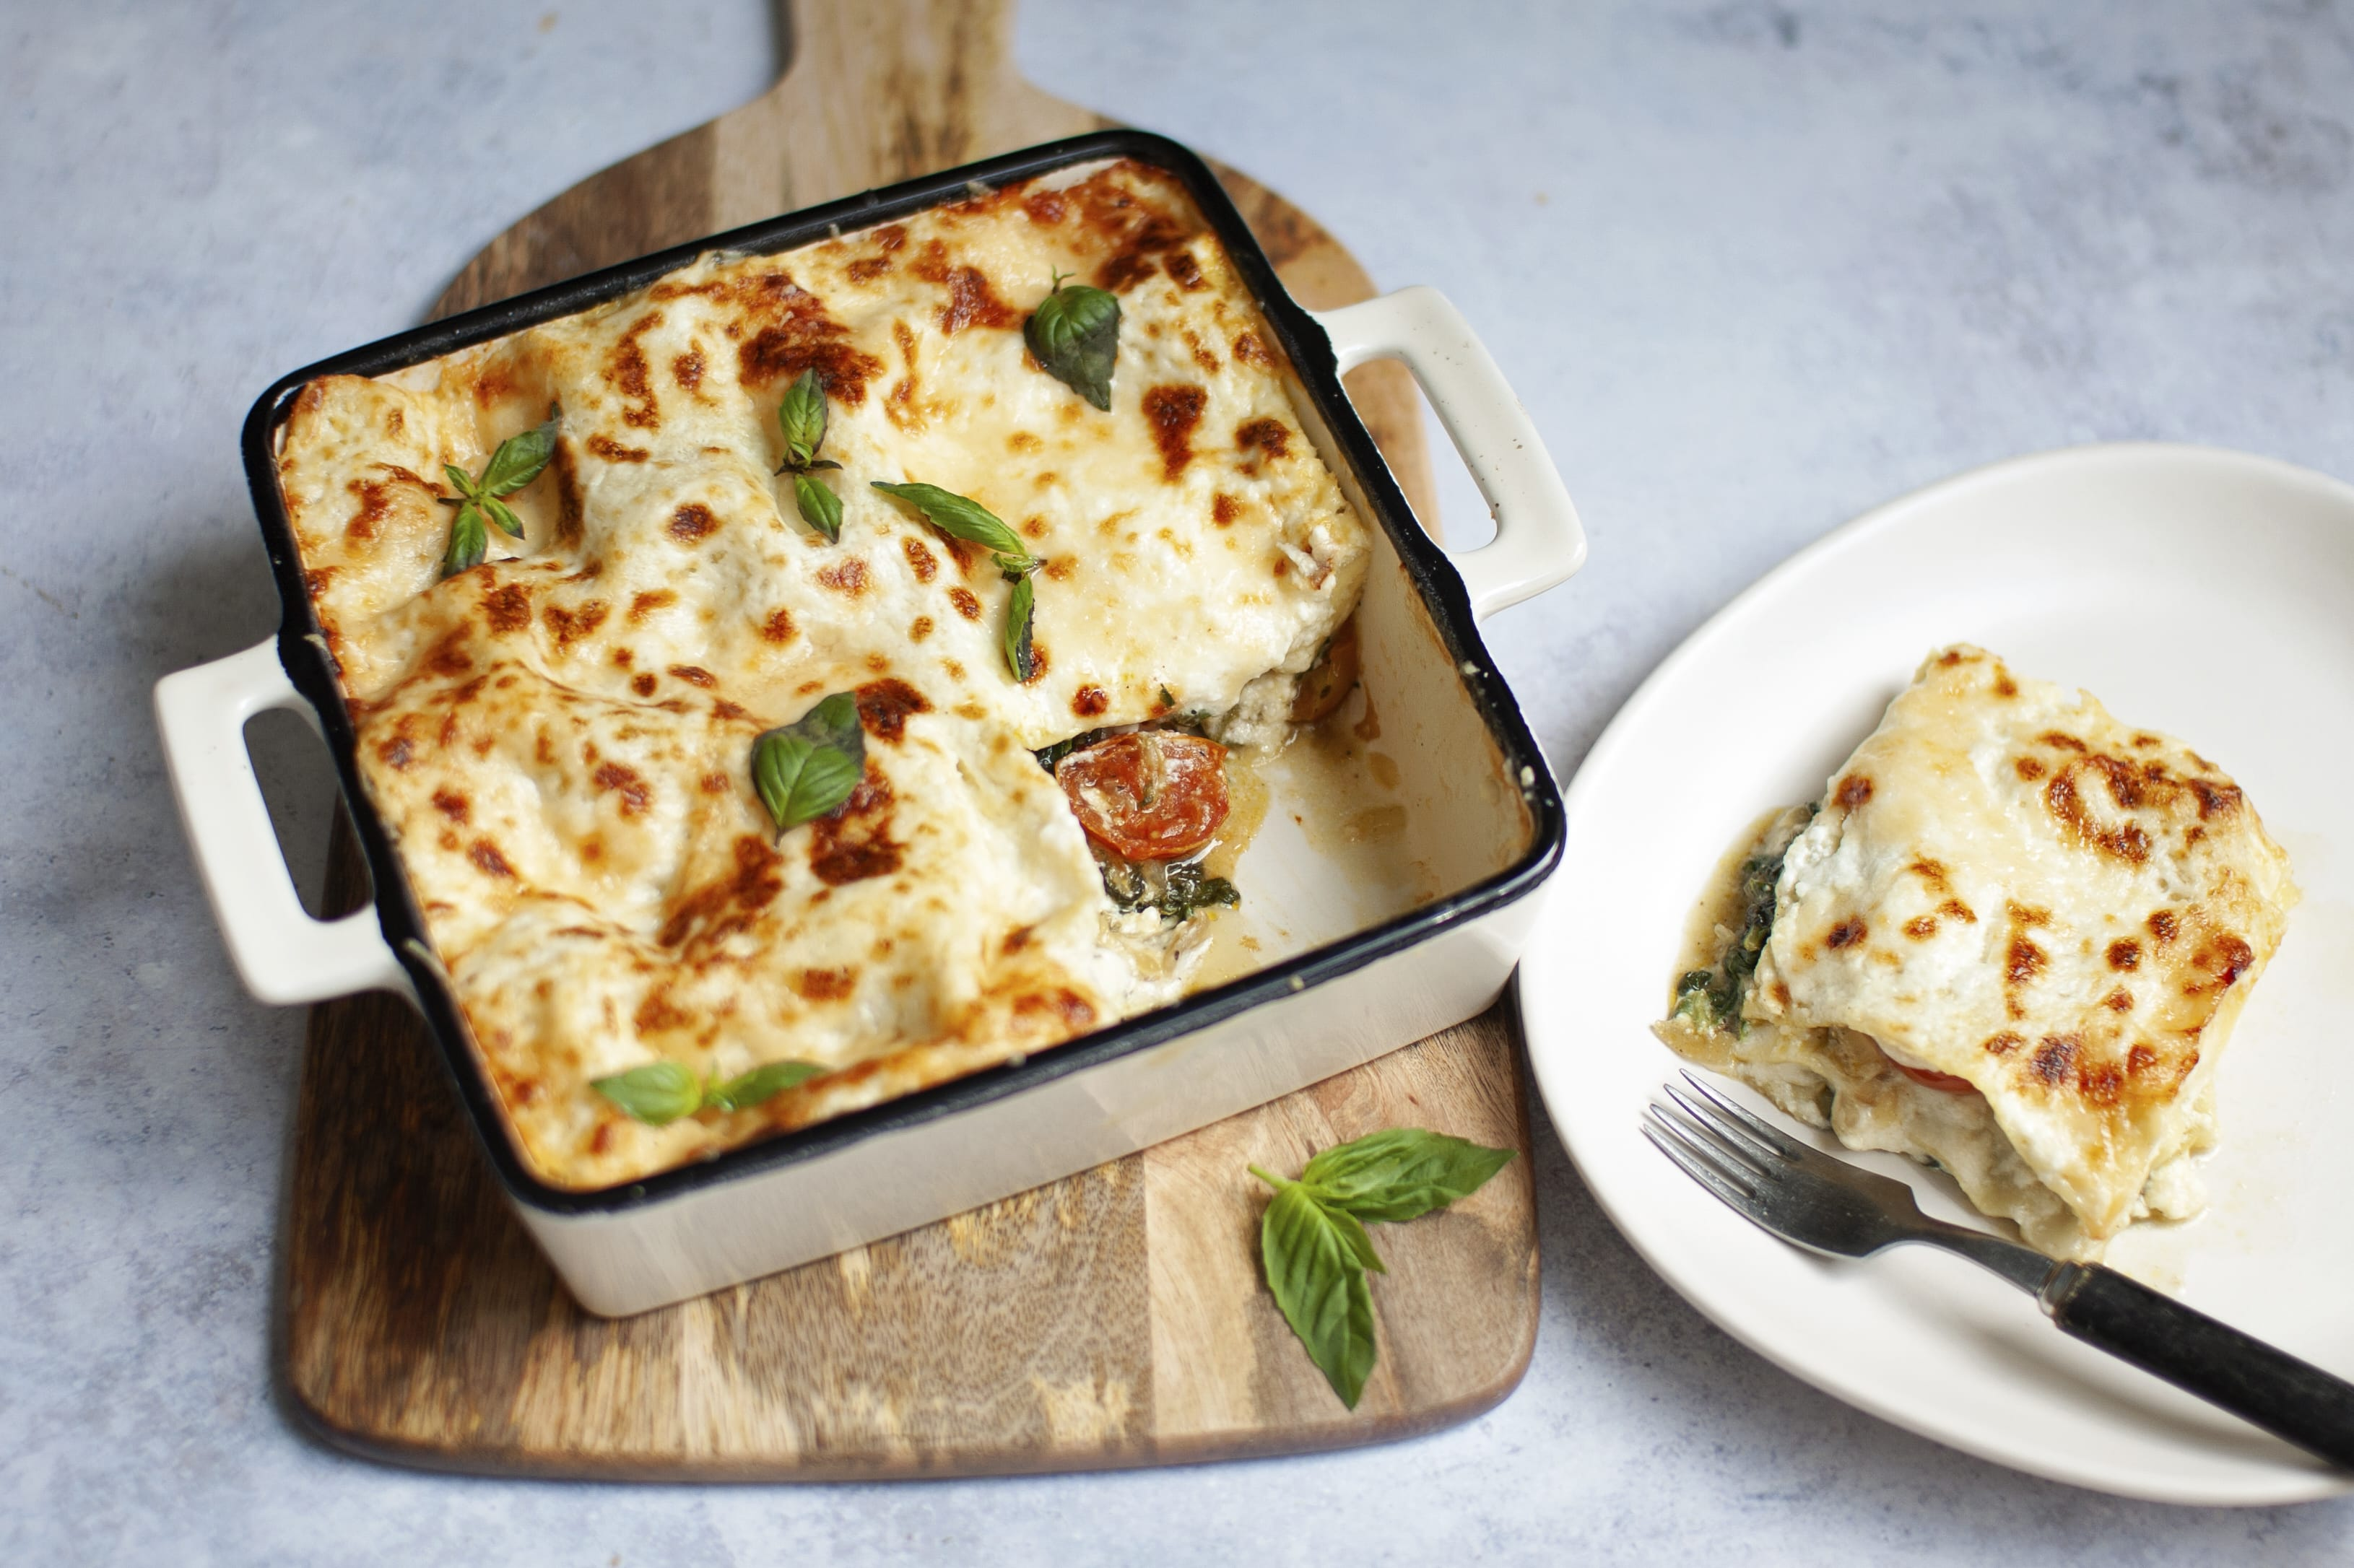 Spinach, Mushroom and Ricotta Lasagna